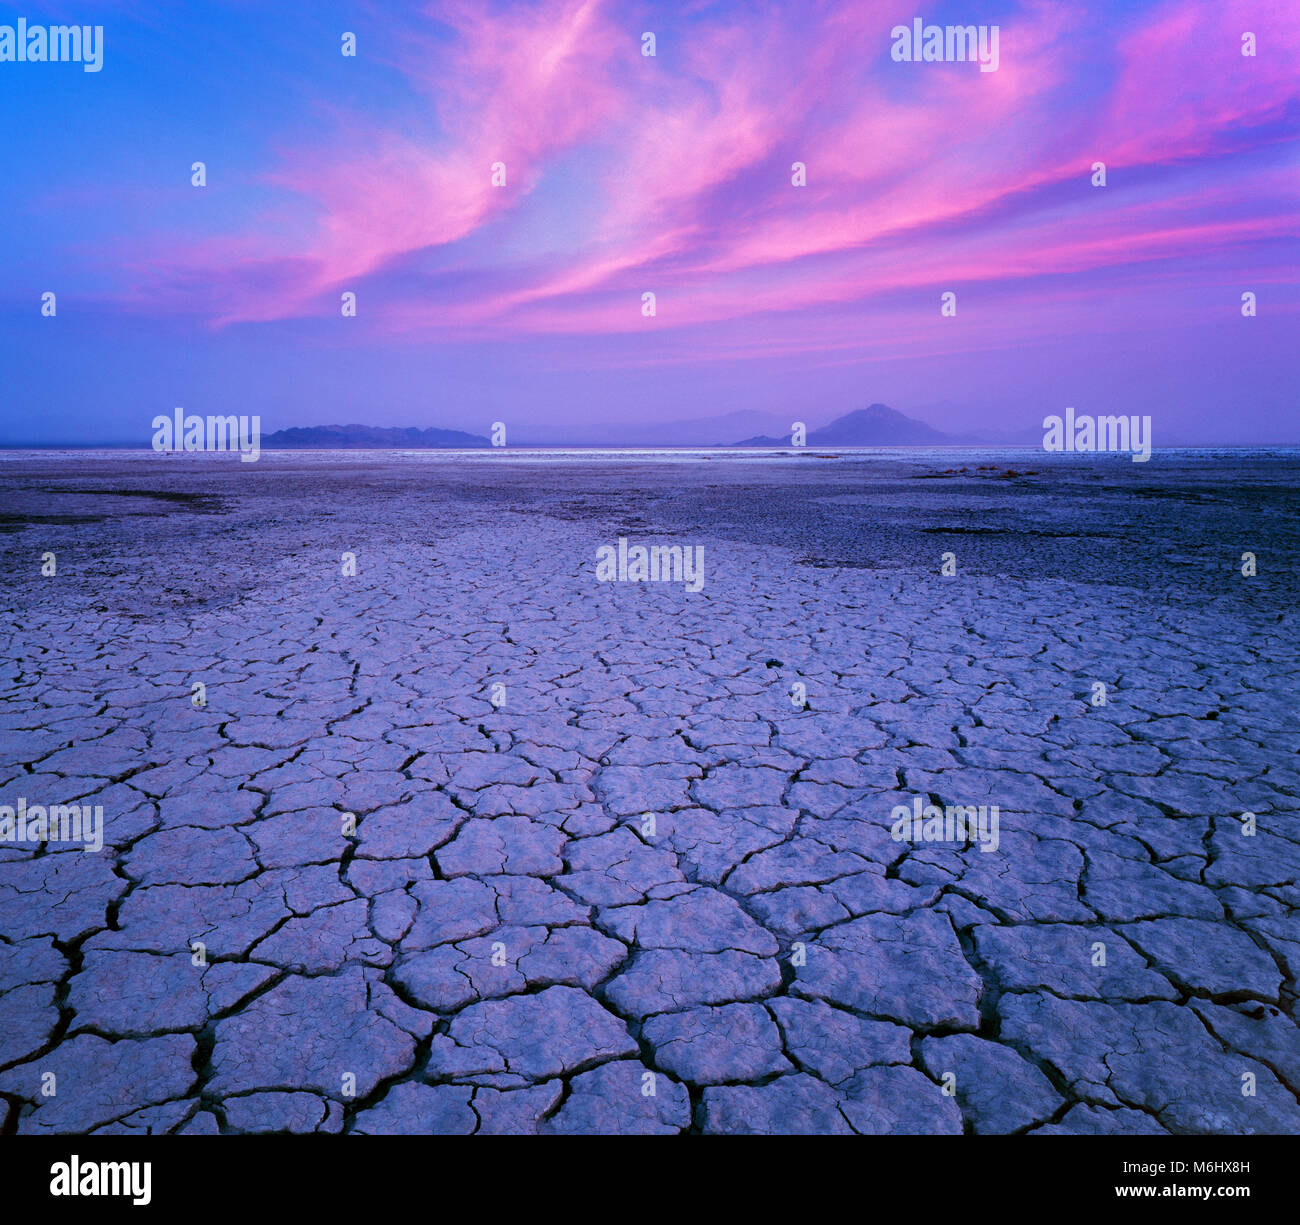 Dämmerung, Soda See, Zzyzx, Mojave National Preserve, Kalifornien Stockbild